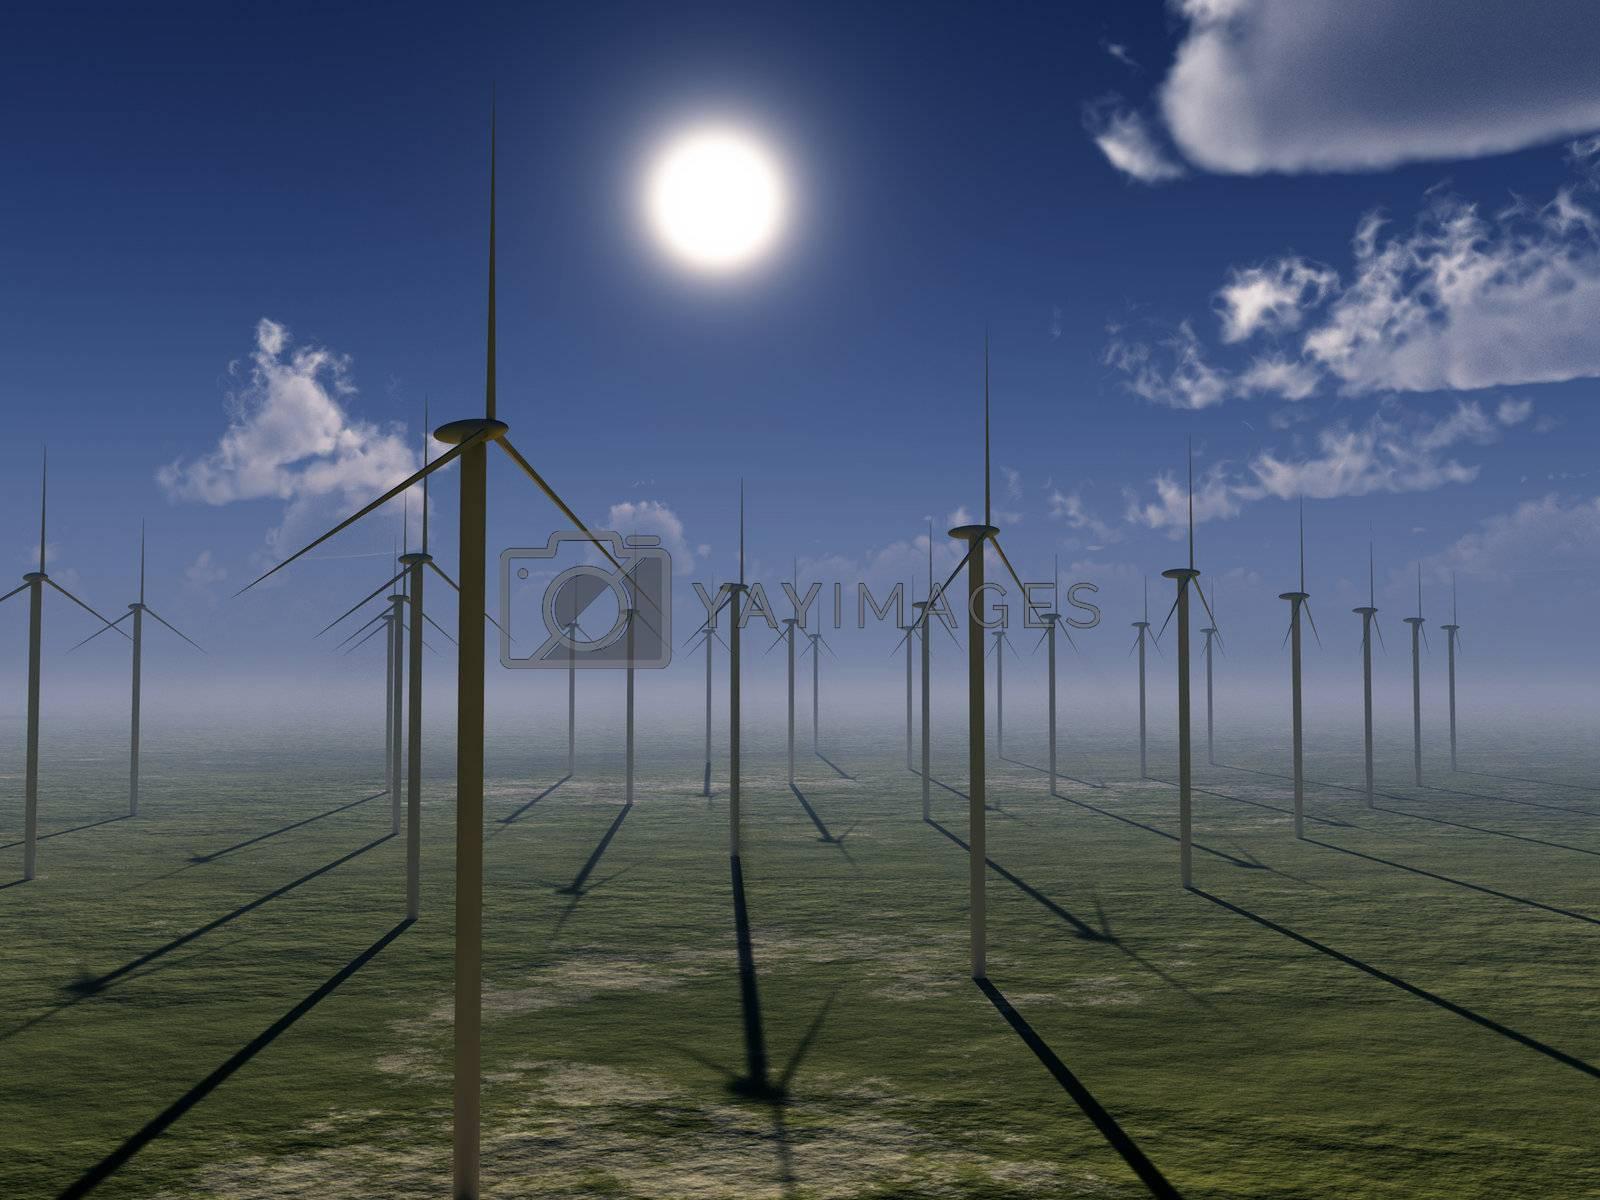 Royalty free image of Wind Farm by harveysart